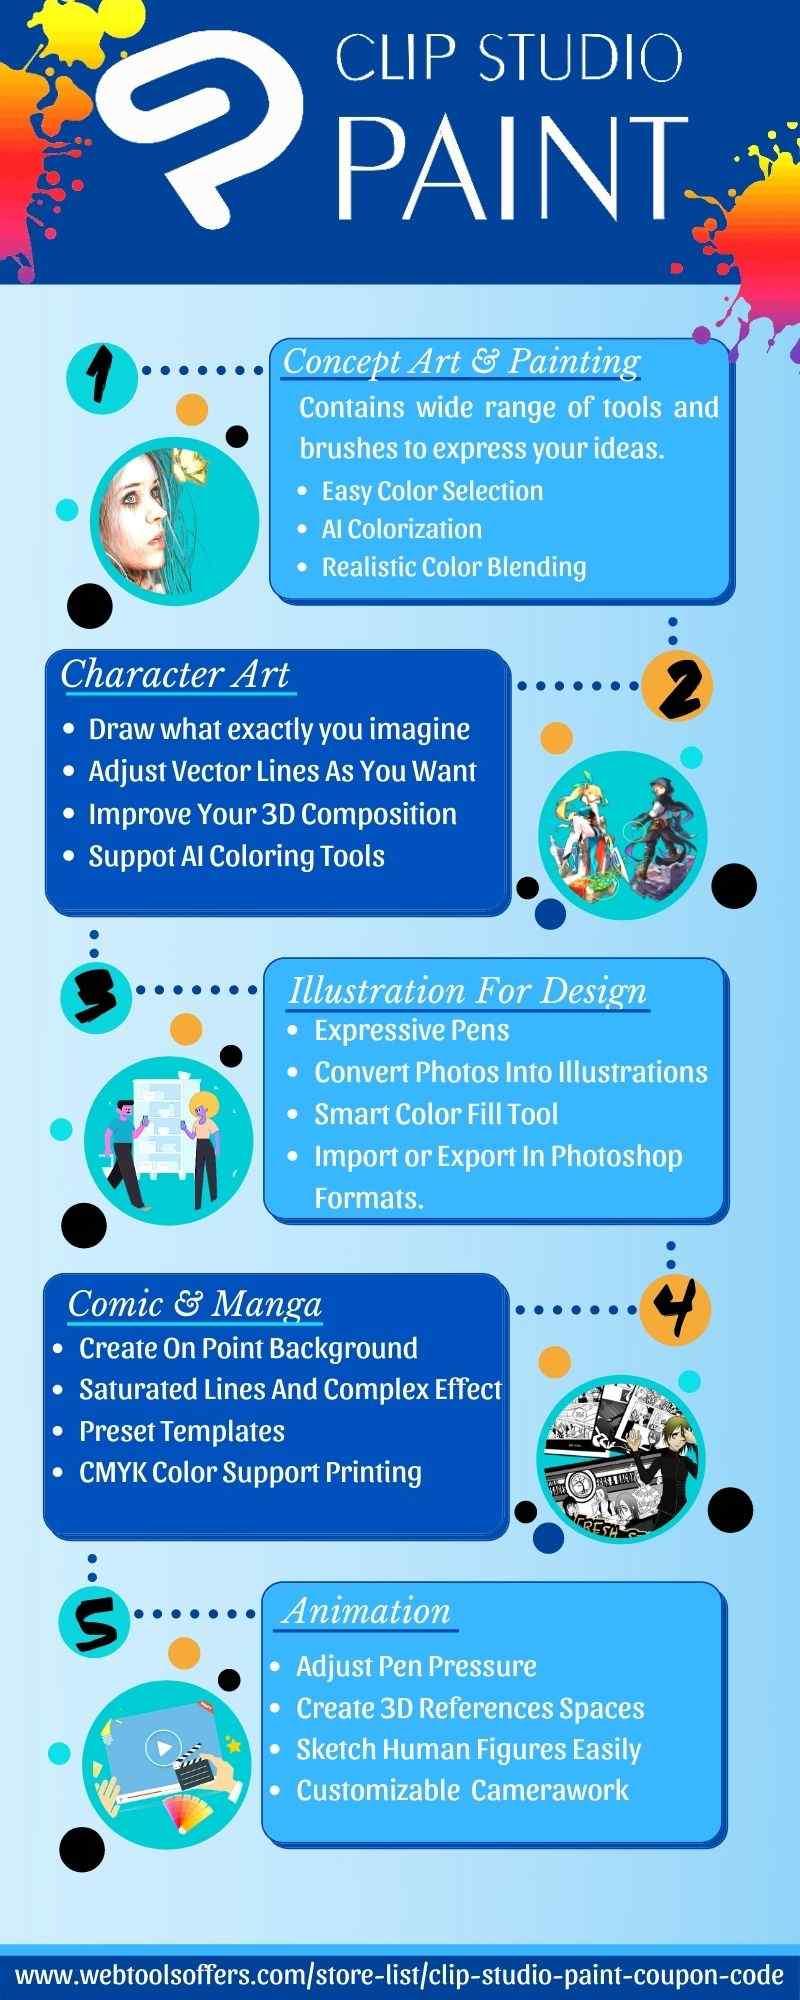 Clip Studio Paint Features Promo Code